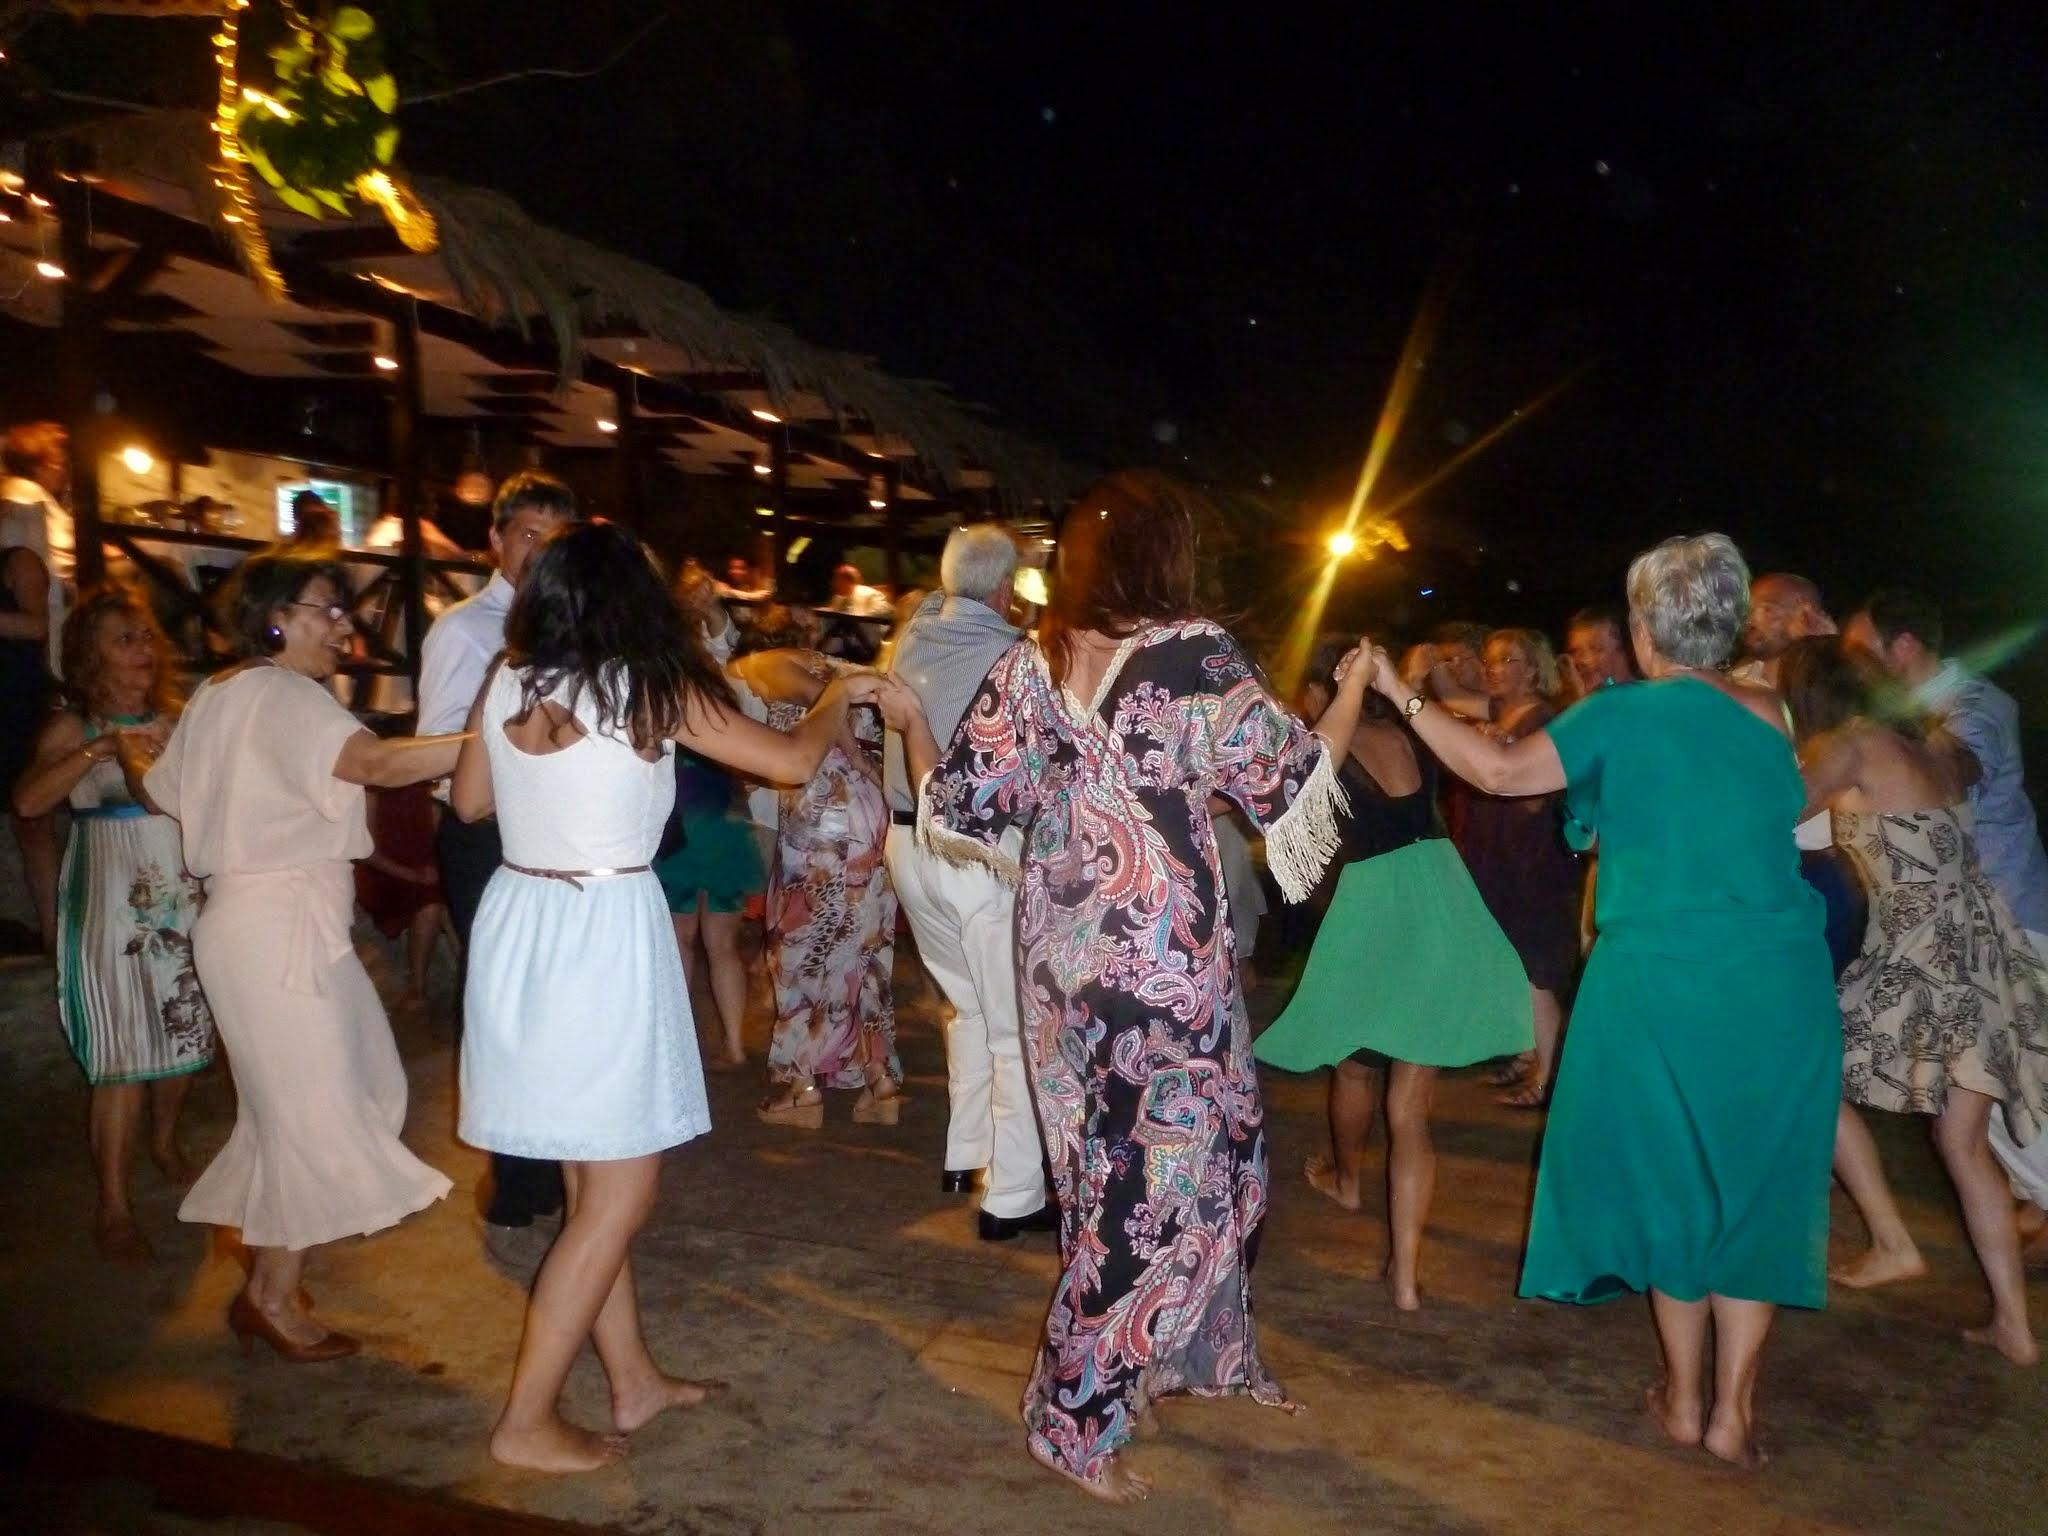 Dancers. Photo credit @mablanc